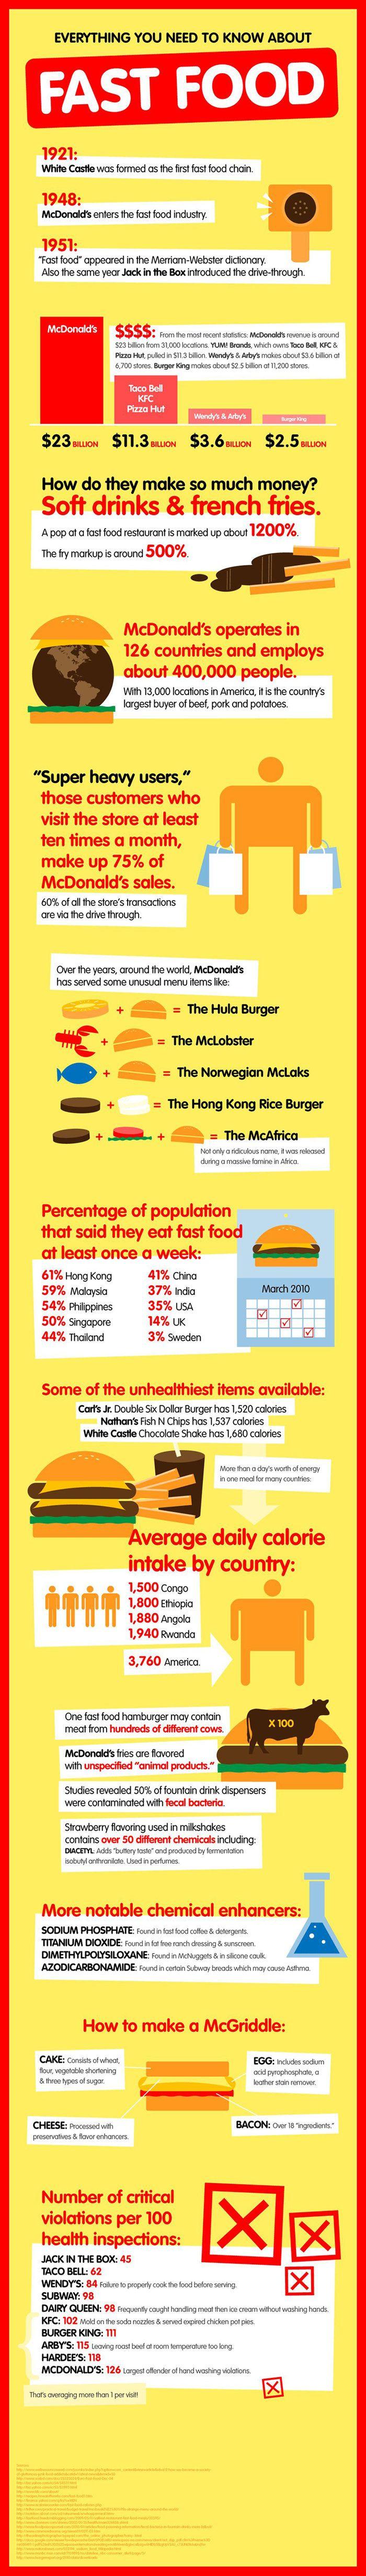 Fast Food Violations